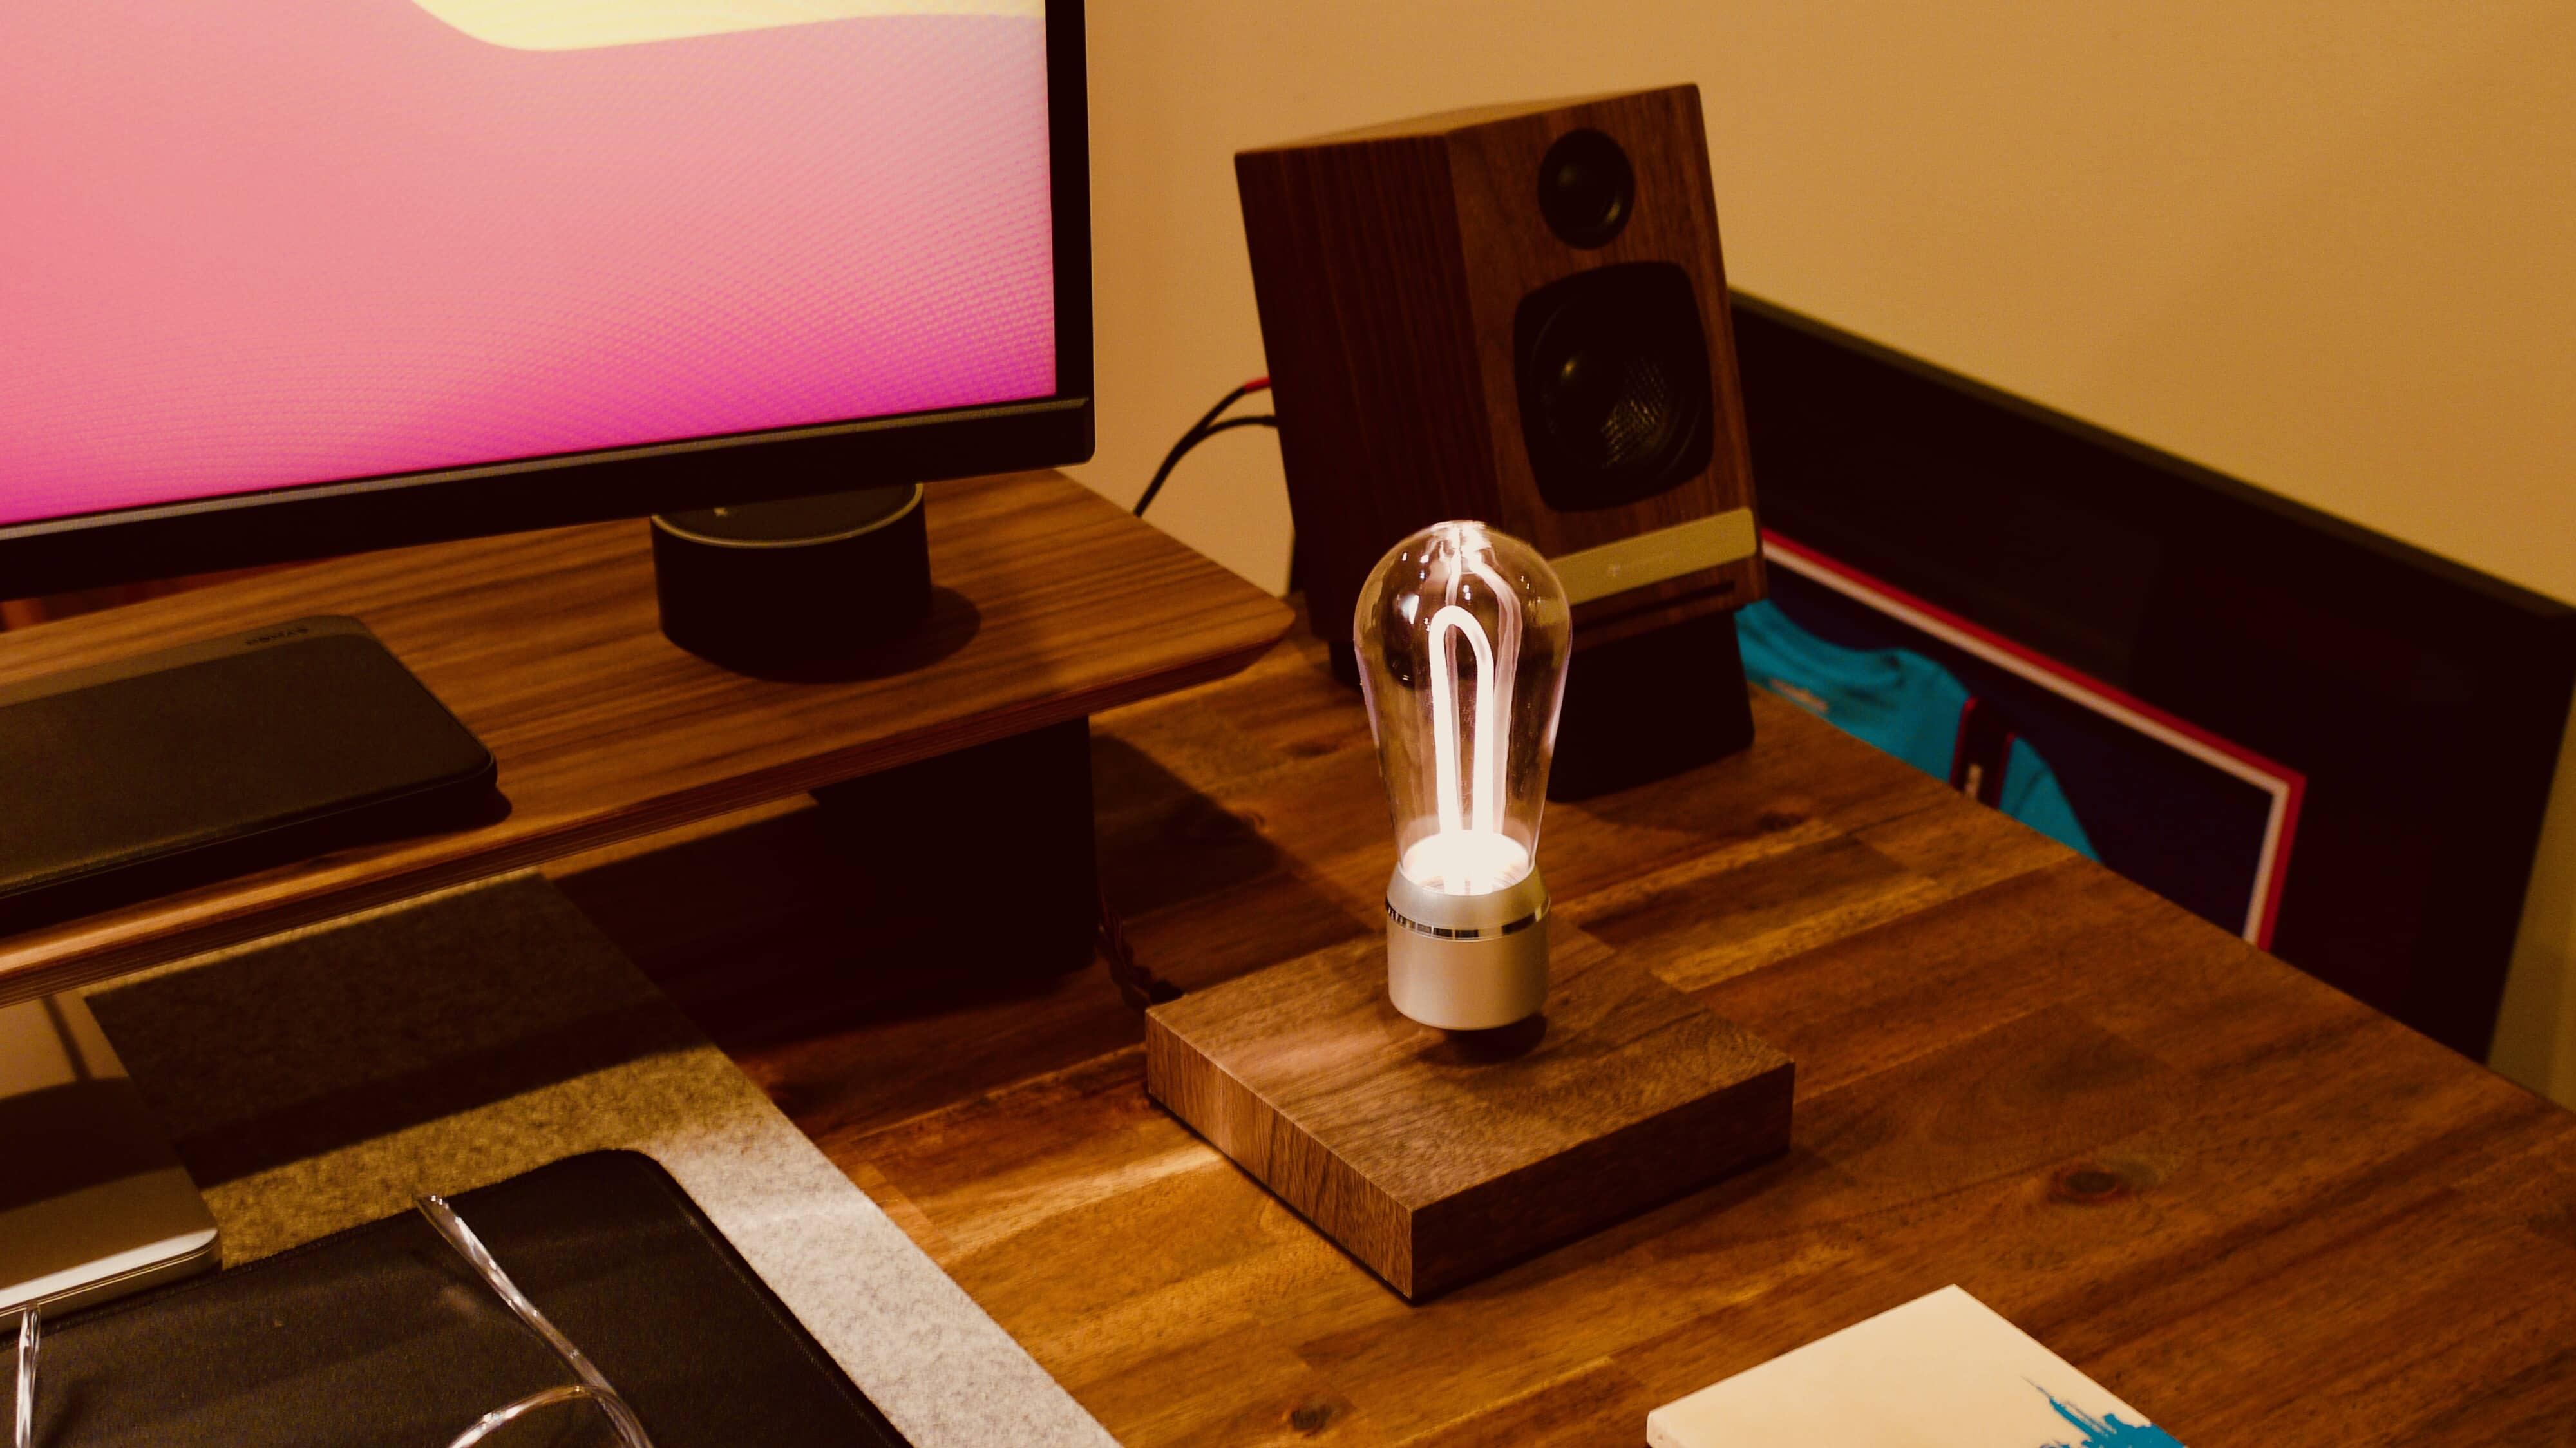 A Flyte Nikola Levitating LED Light? Well, that's cool.